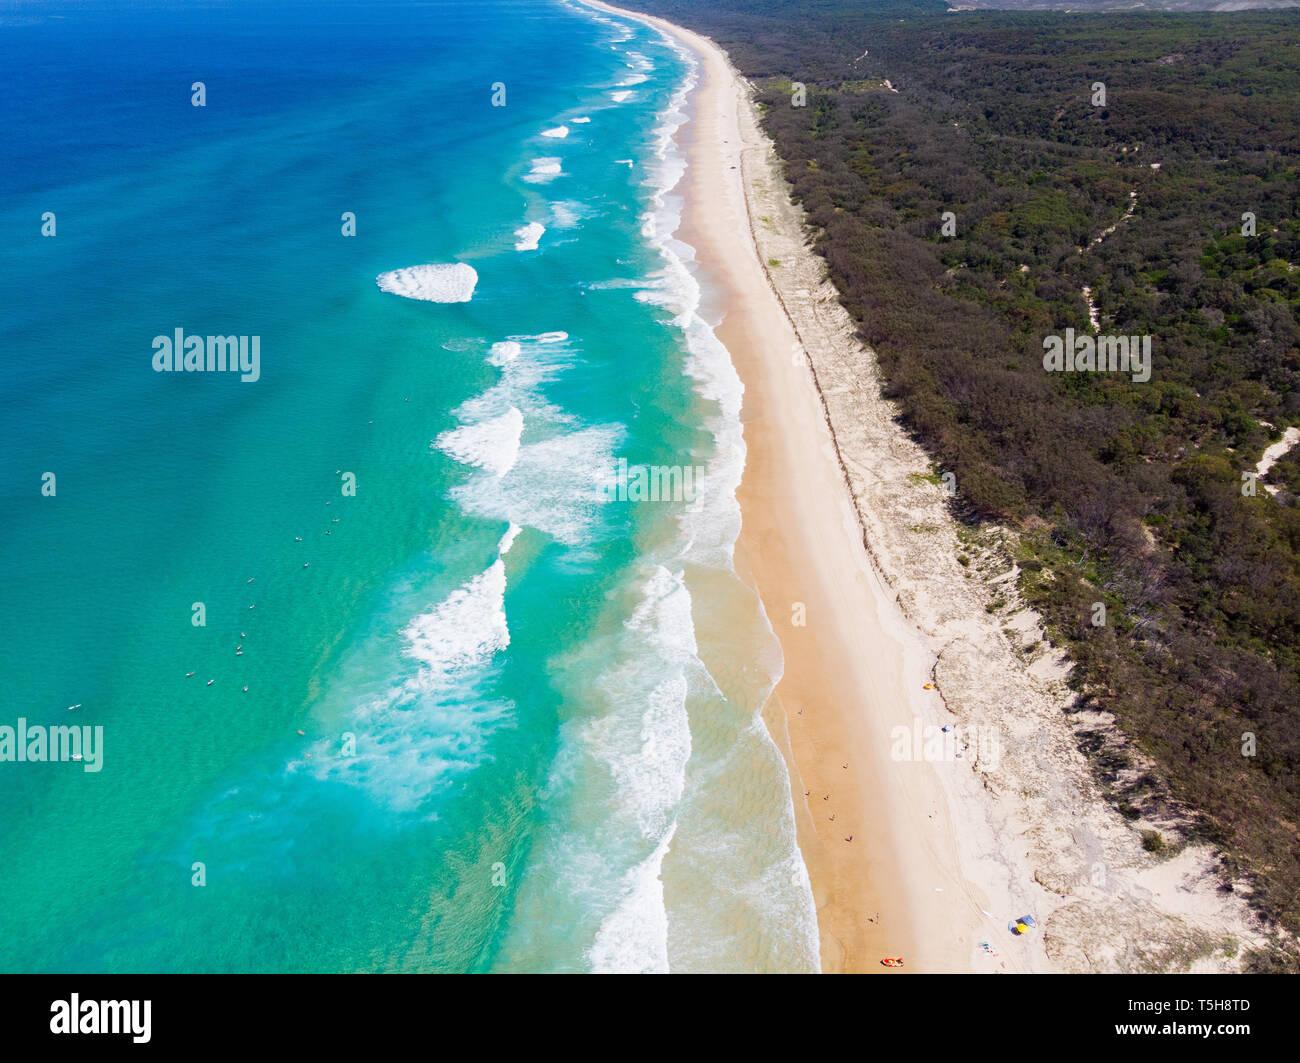 Agua Azul tropical en Australia Imagen De Stock